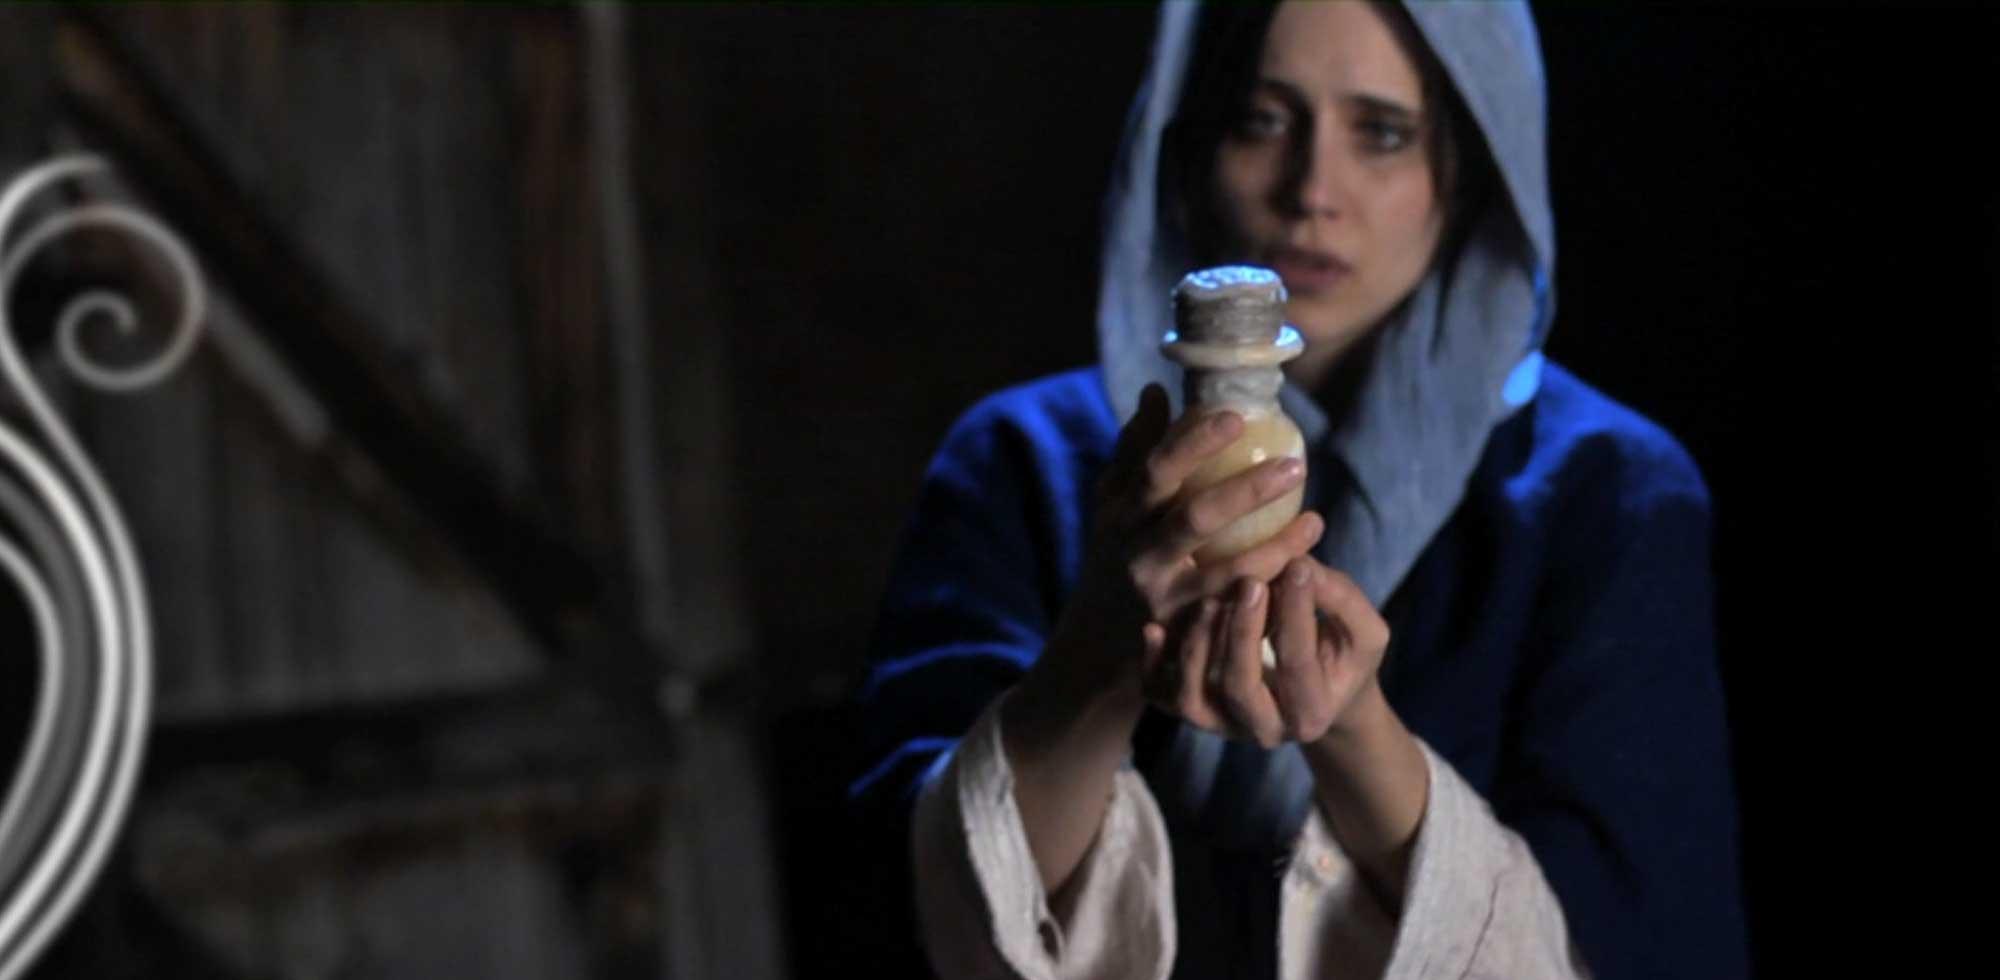 Mary holding a jar of perfume